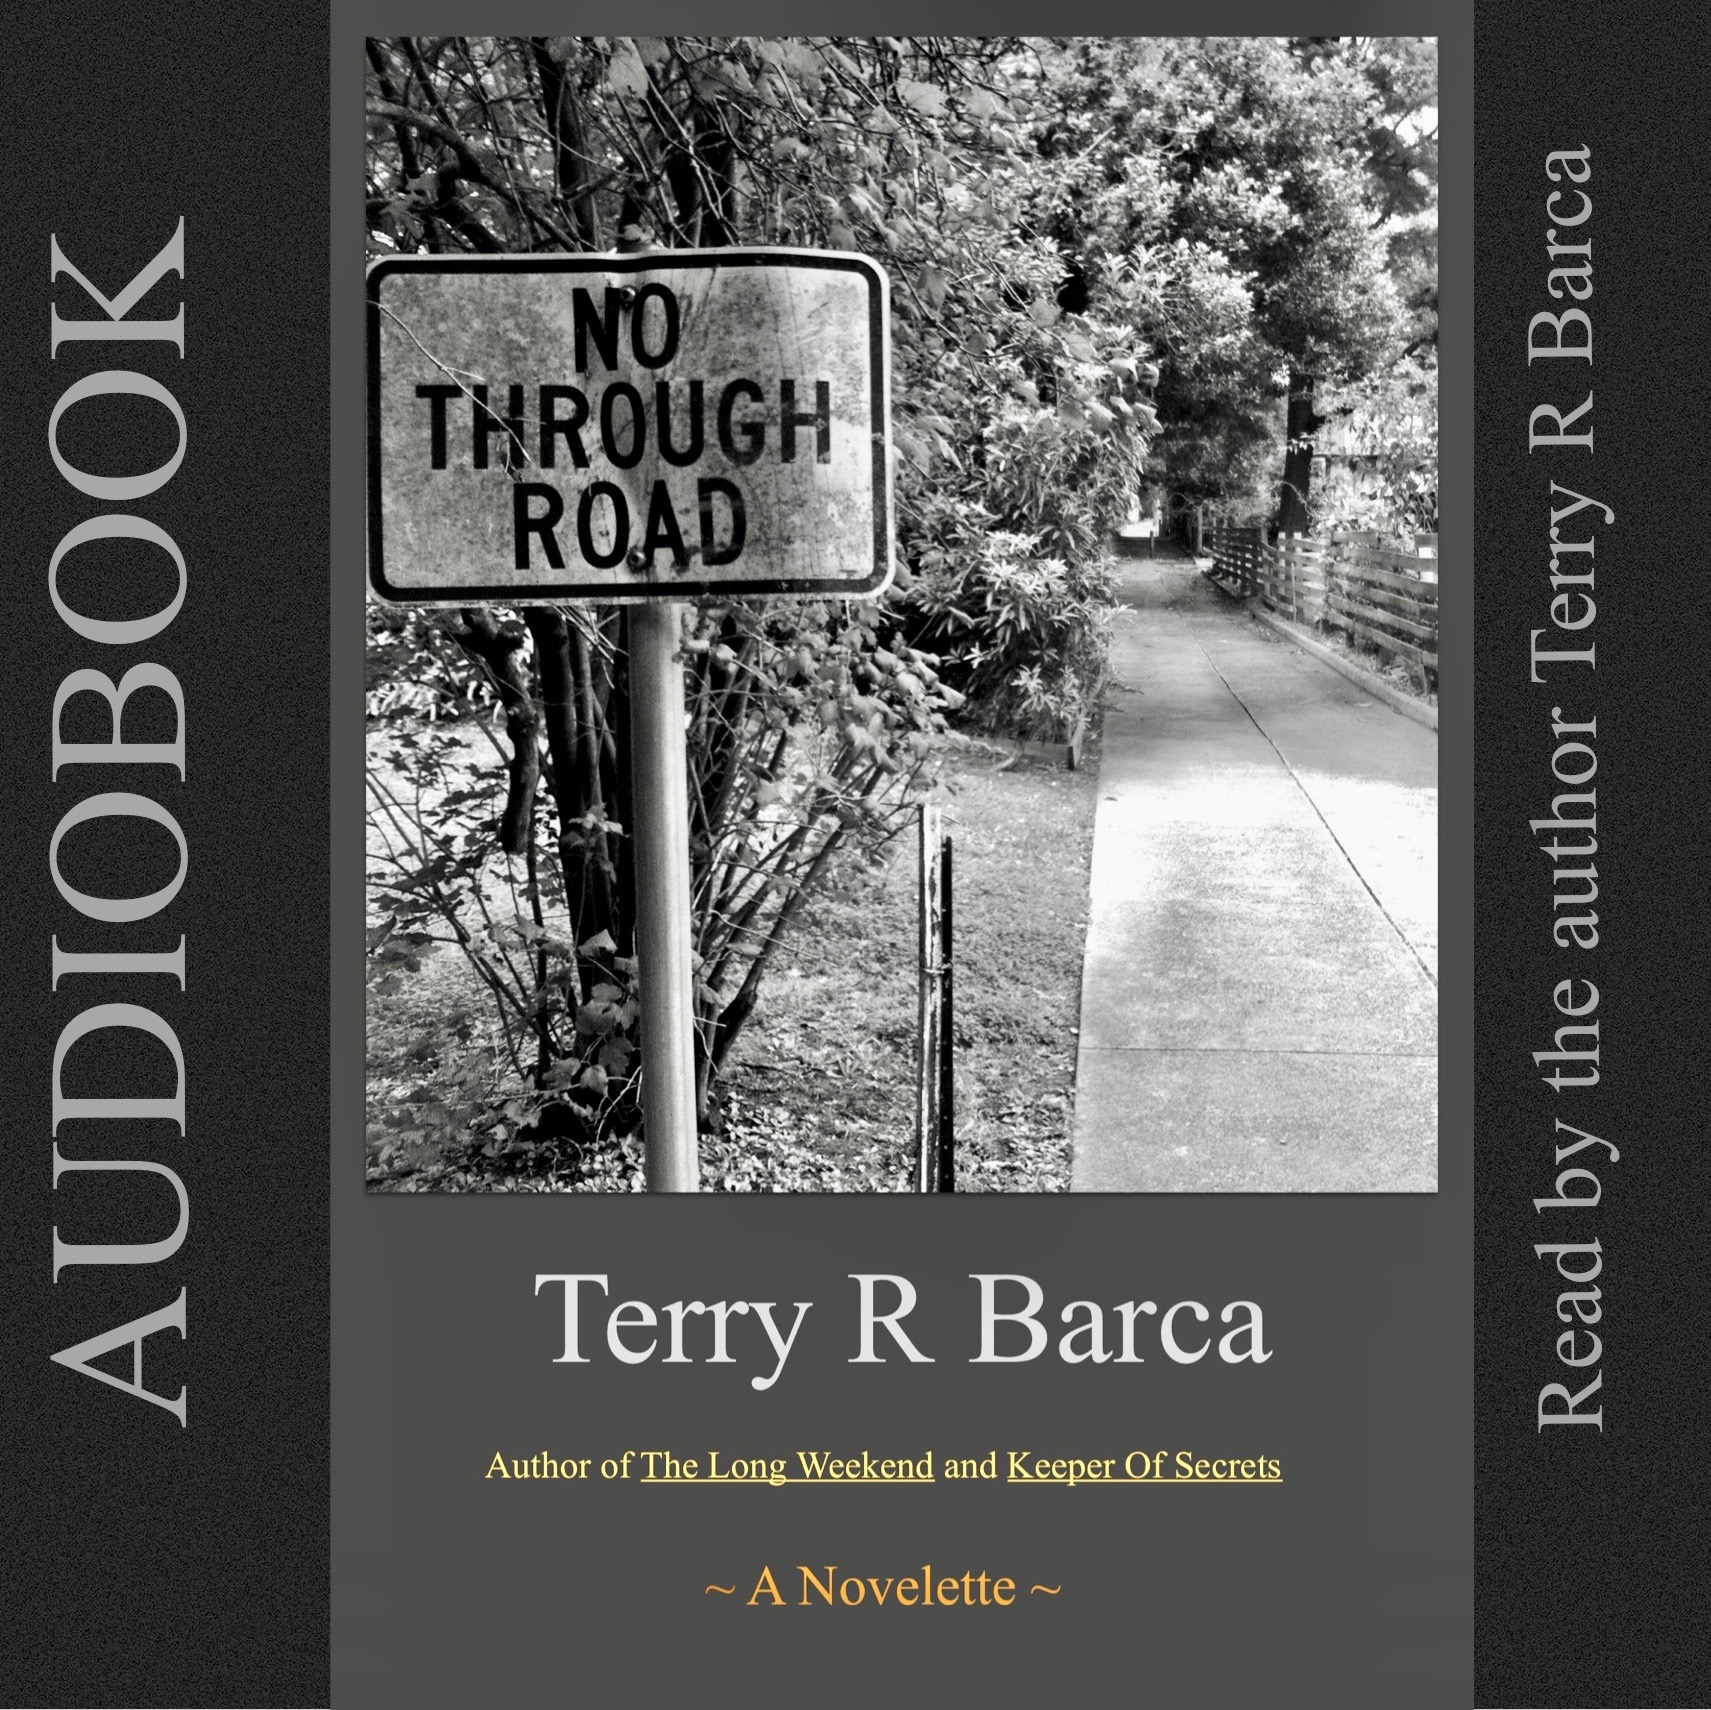 audiobooks are one year old araneus1